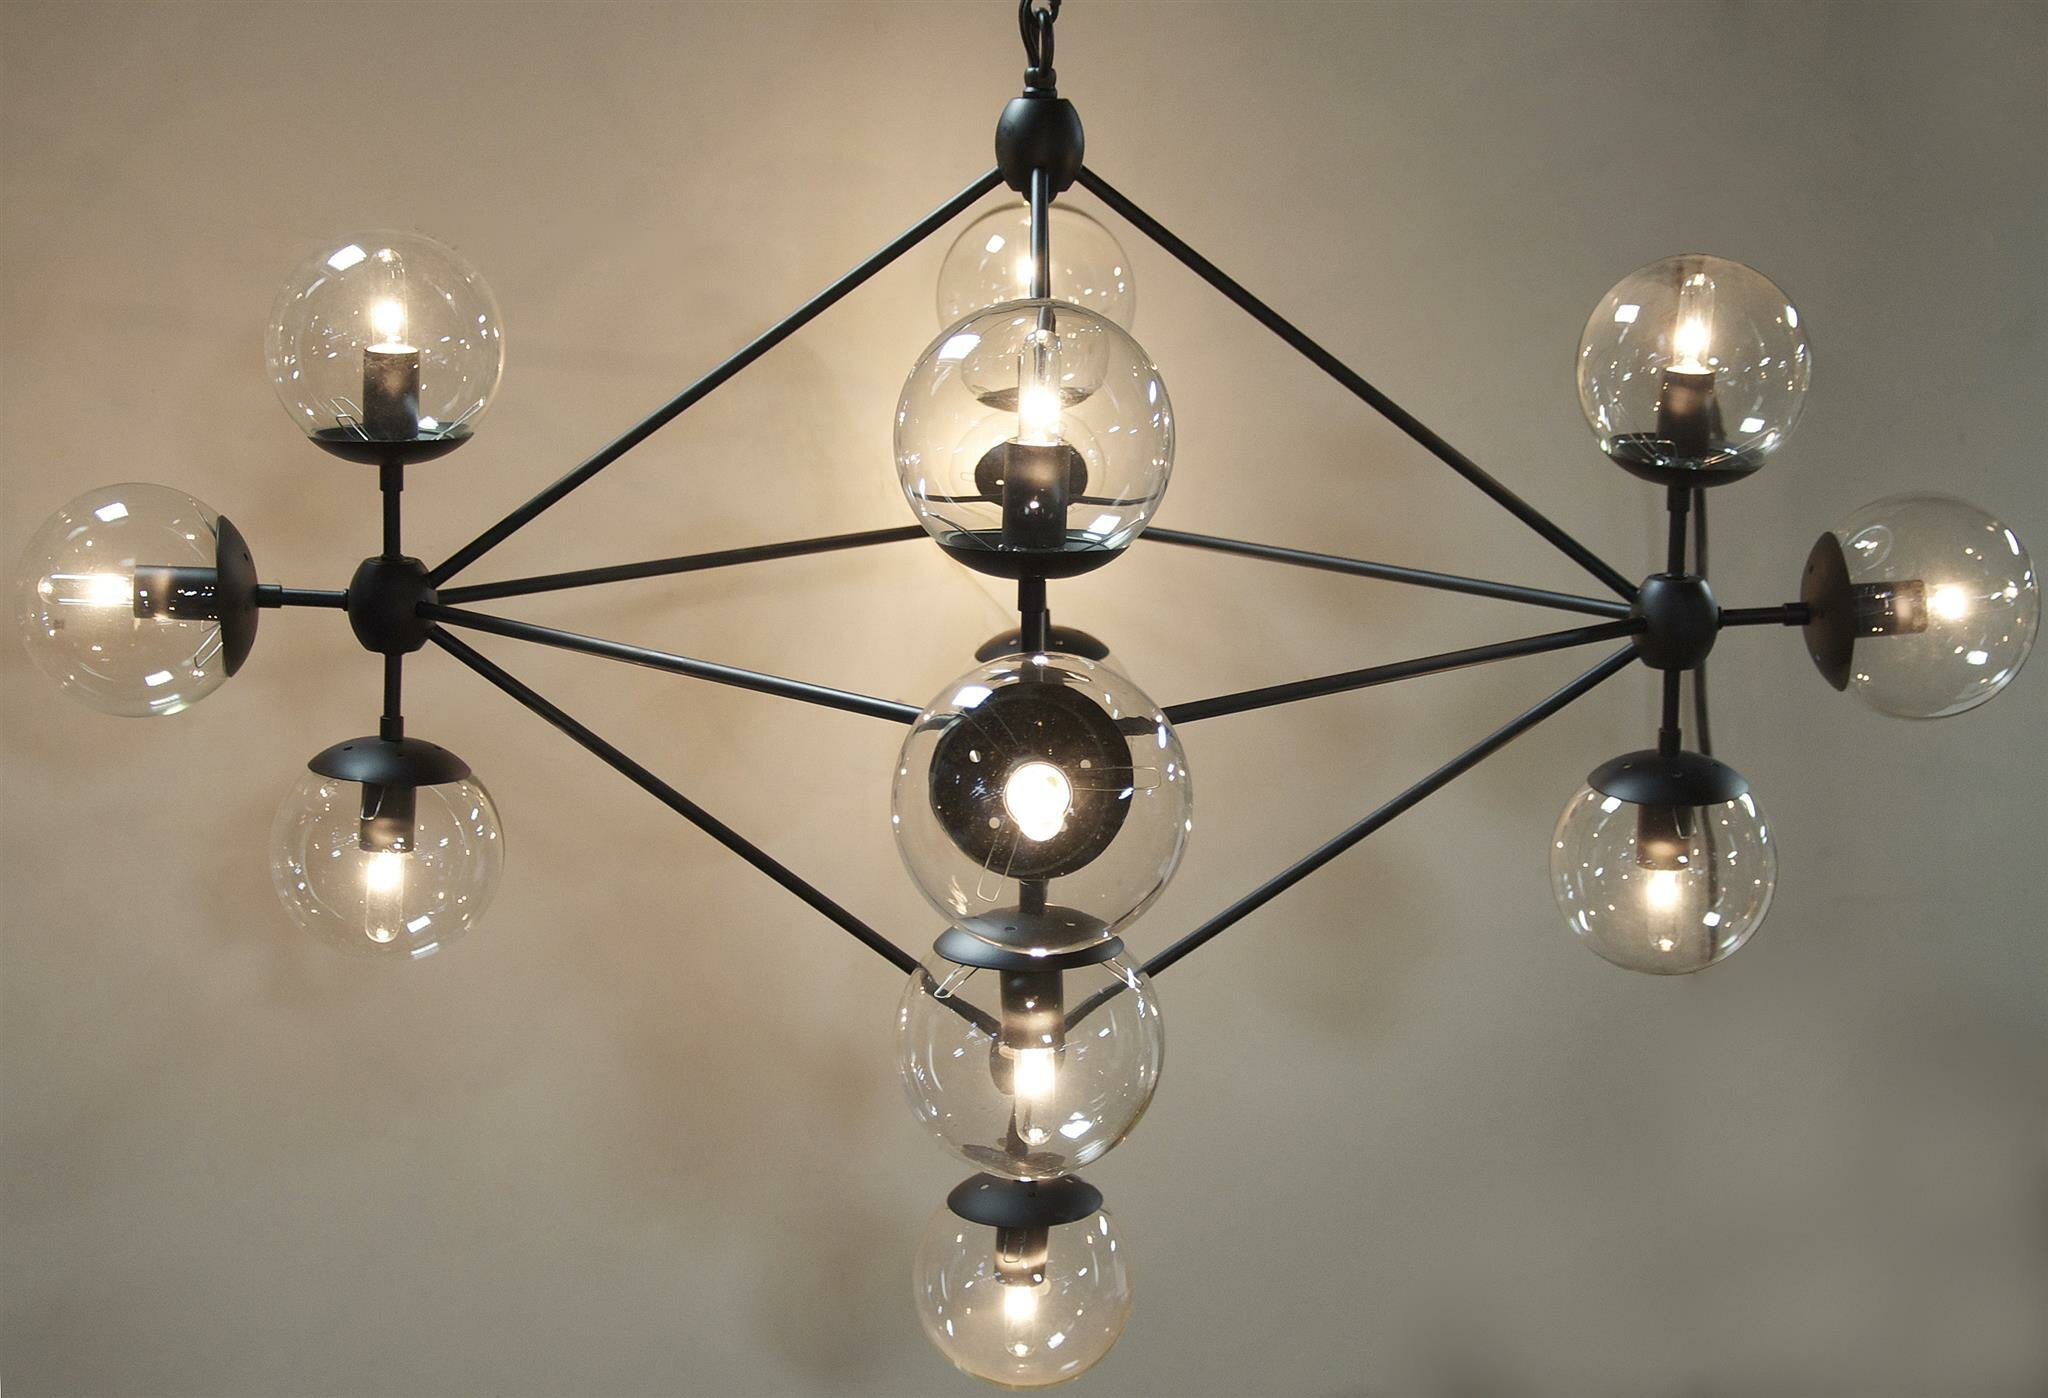 ceiling alt uk light lamps lighting b sputnik image chand chandelier category bulb by